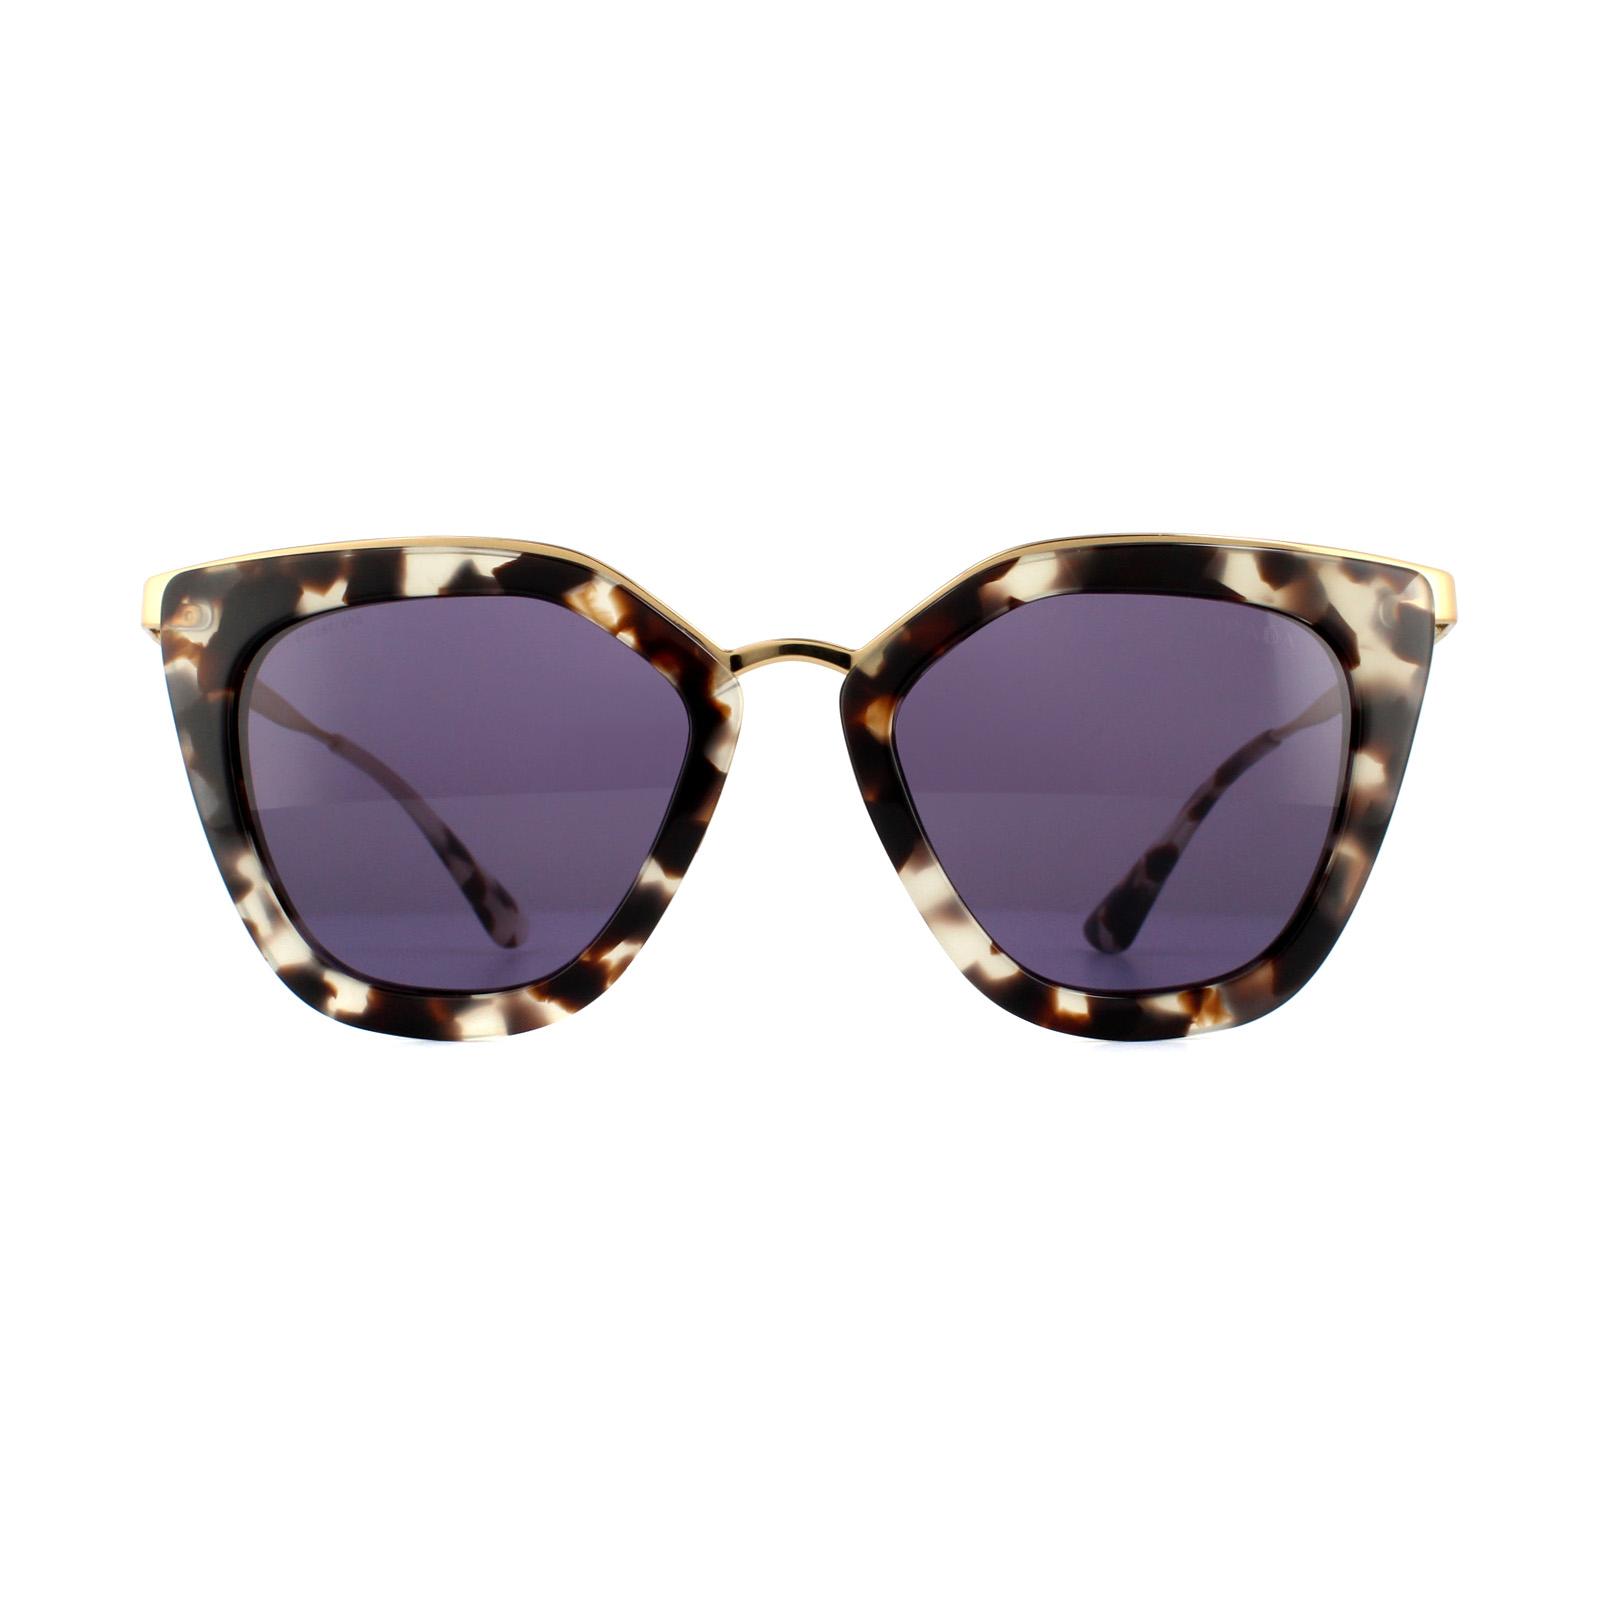 6093fcada749 Sentinel Prada Sunglasses Cinema Evolution 53SS UAO6O2 White Havana Violet